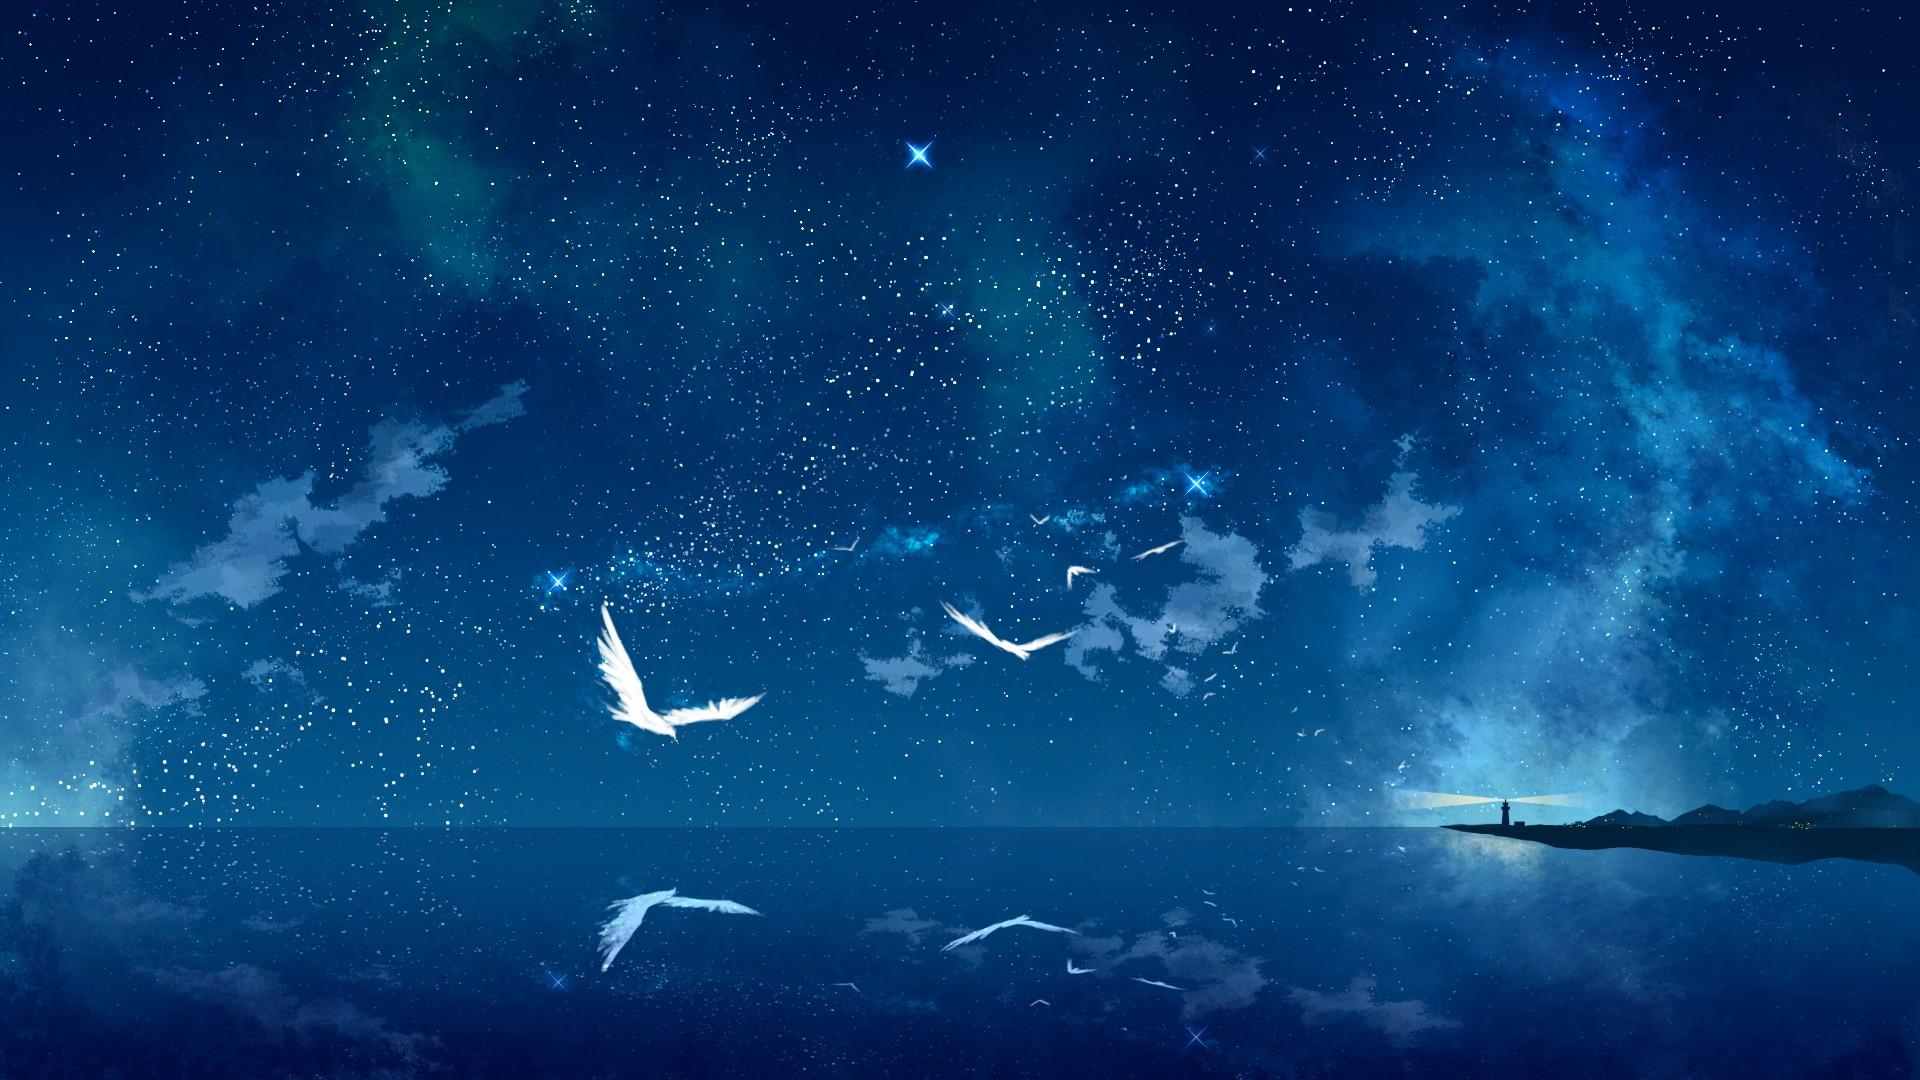 General 1920x1080 fantasy art night sky stars sea light house sea gulls birds digital art nature